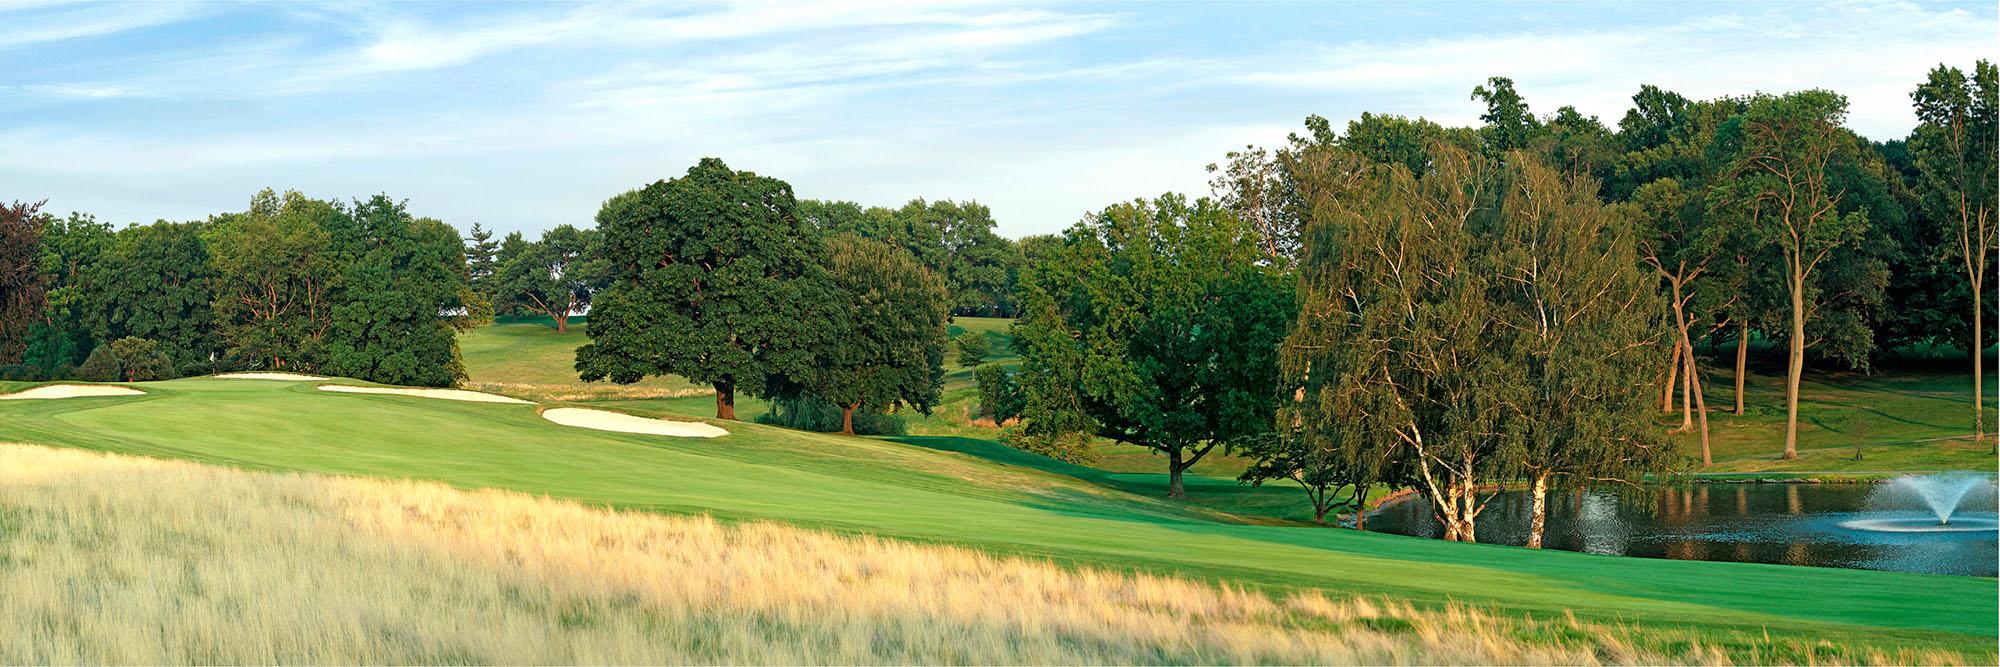 Golf Course Image - Philadelphia Country Club Springmill No. 10